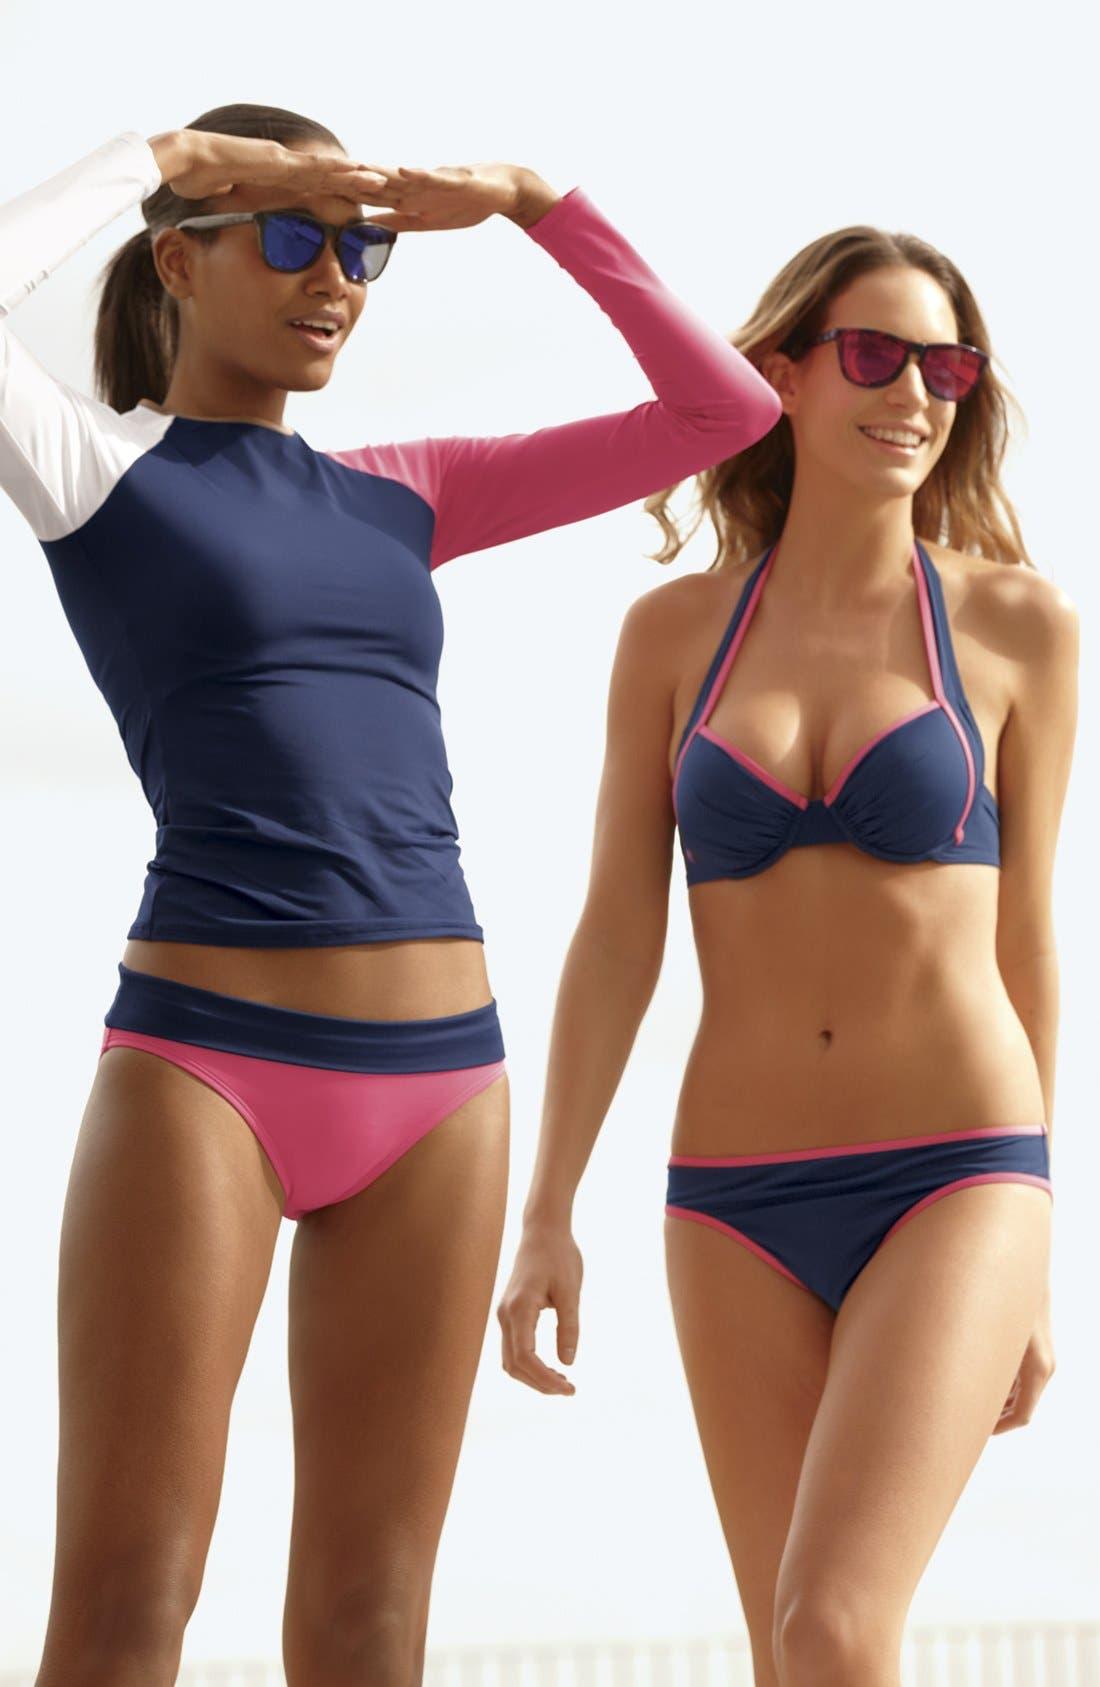 Alternate Image 3  - Tommy Bahama Rashguard & Bikini Bottoms, 'Deck Piping' Bikini Top & Bottoms